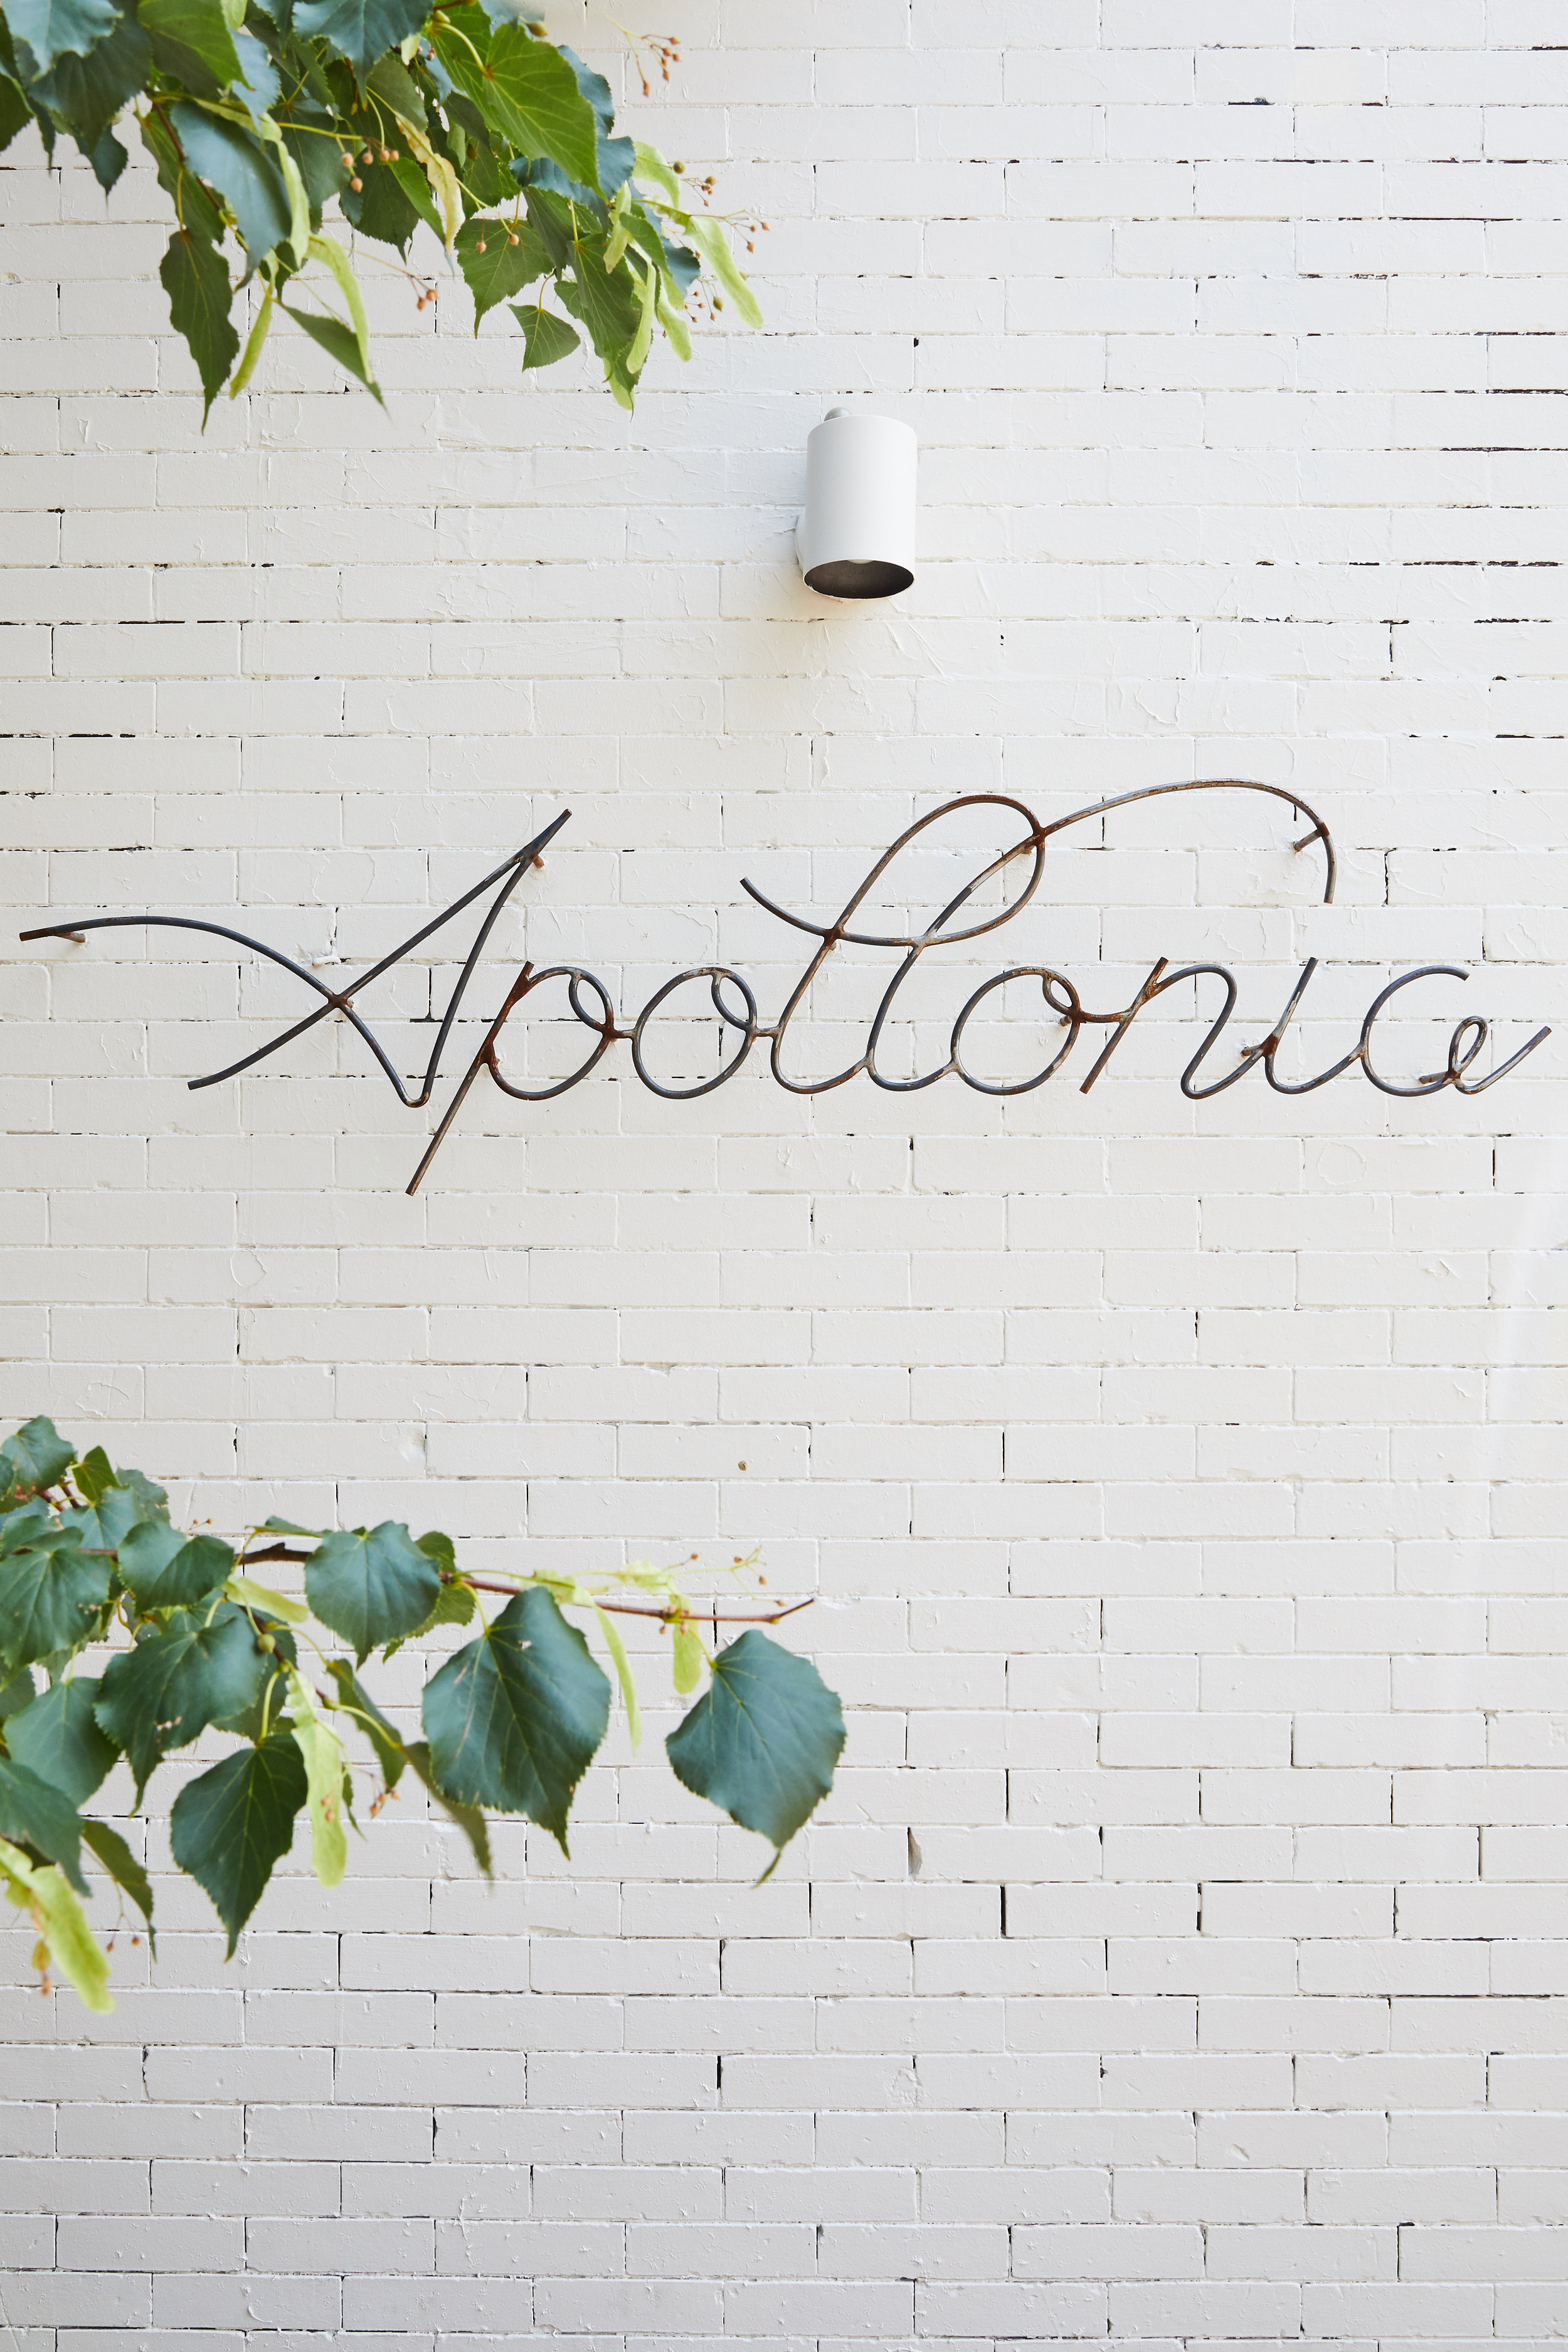 SE_Apollonia_Interiors_166.jpg